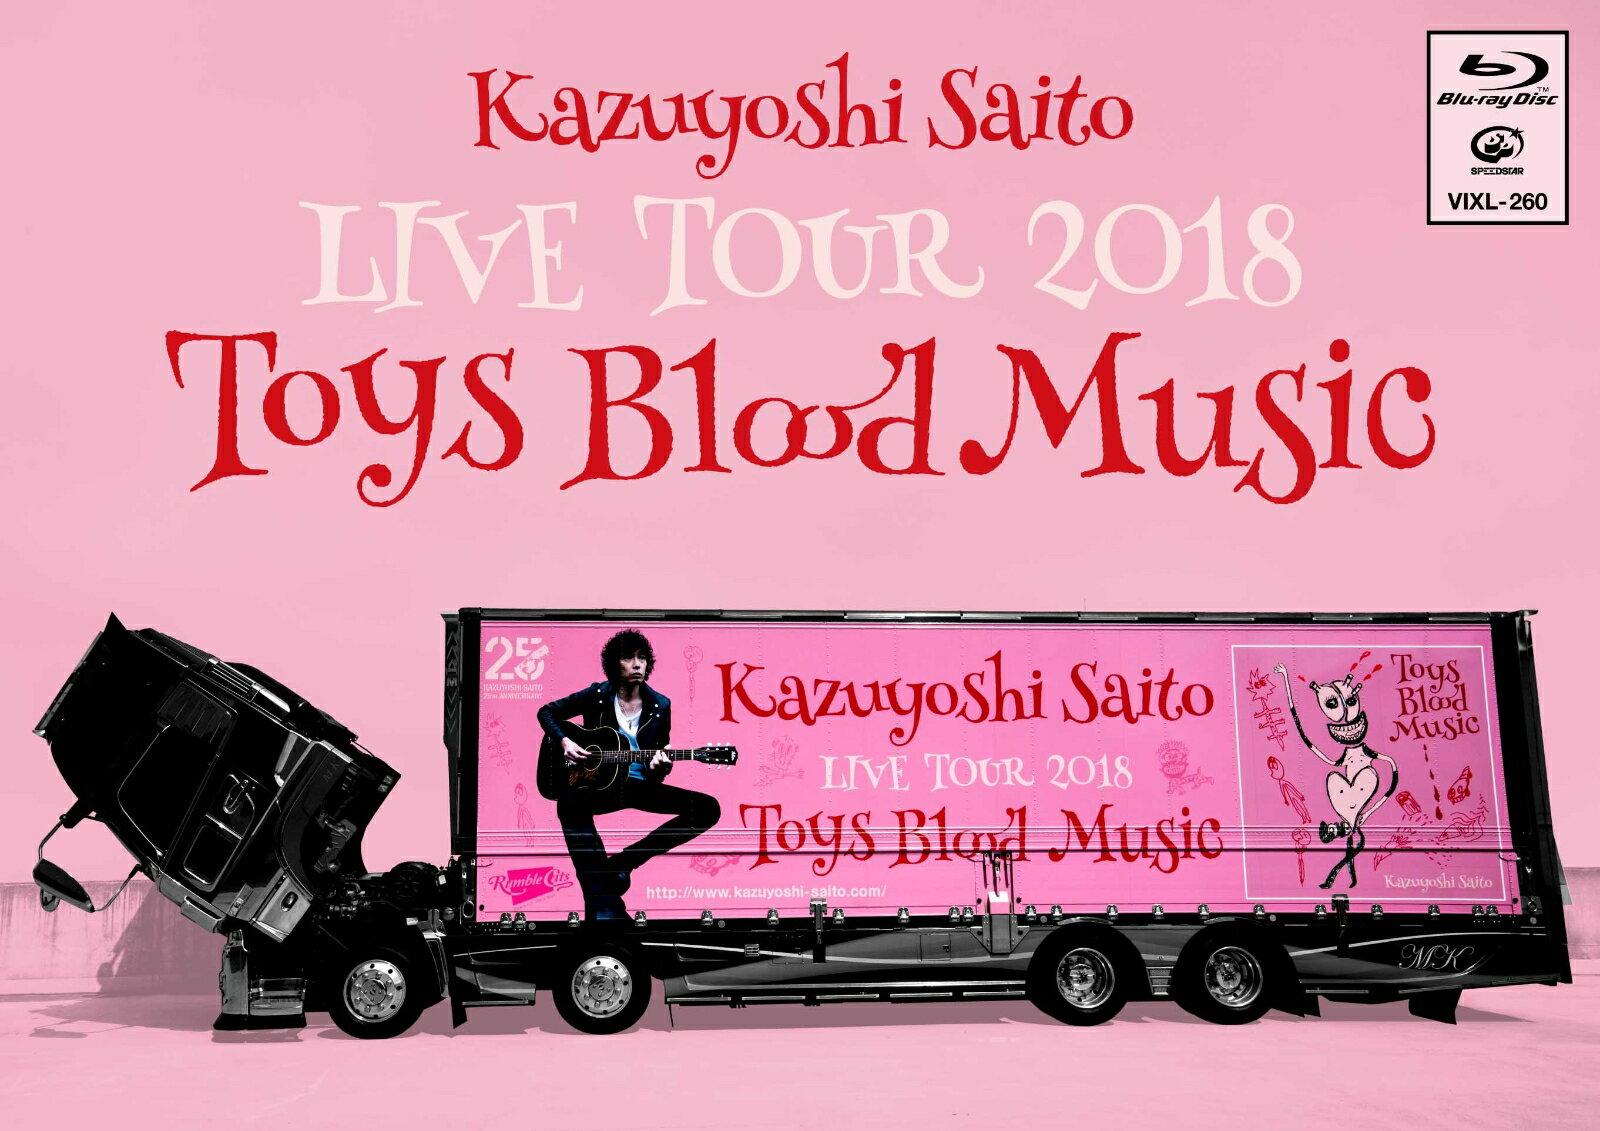 KAZUYOSHI SAITO LIVE TOUR 2018 Toys Blood Music Live at 山梨コラニー文化ホール 2018.6.2【Blu-ray】 [ 斉藤和義 ]